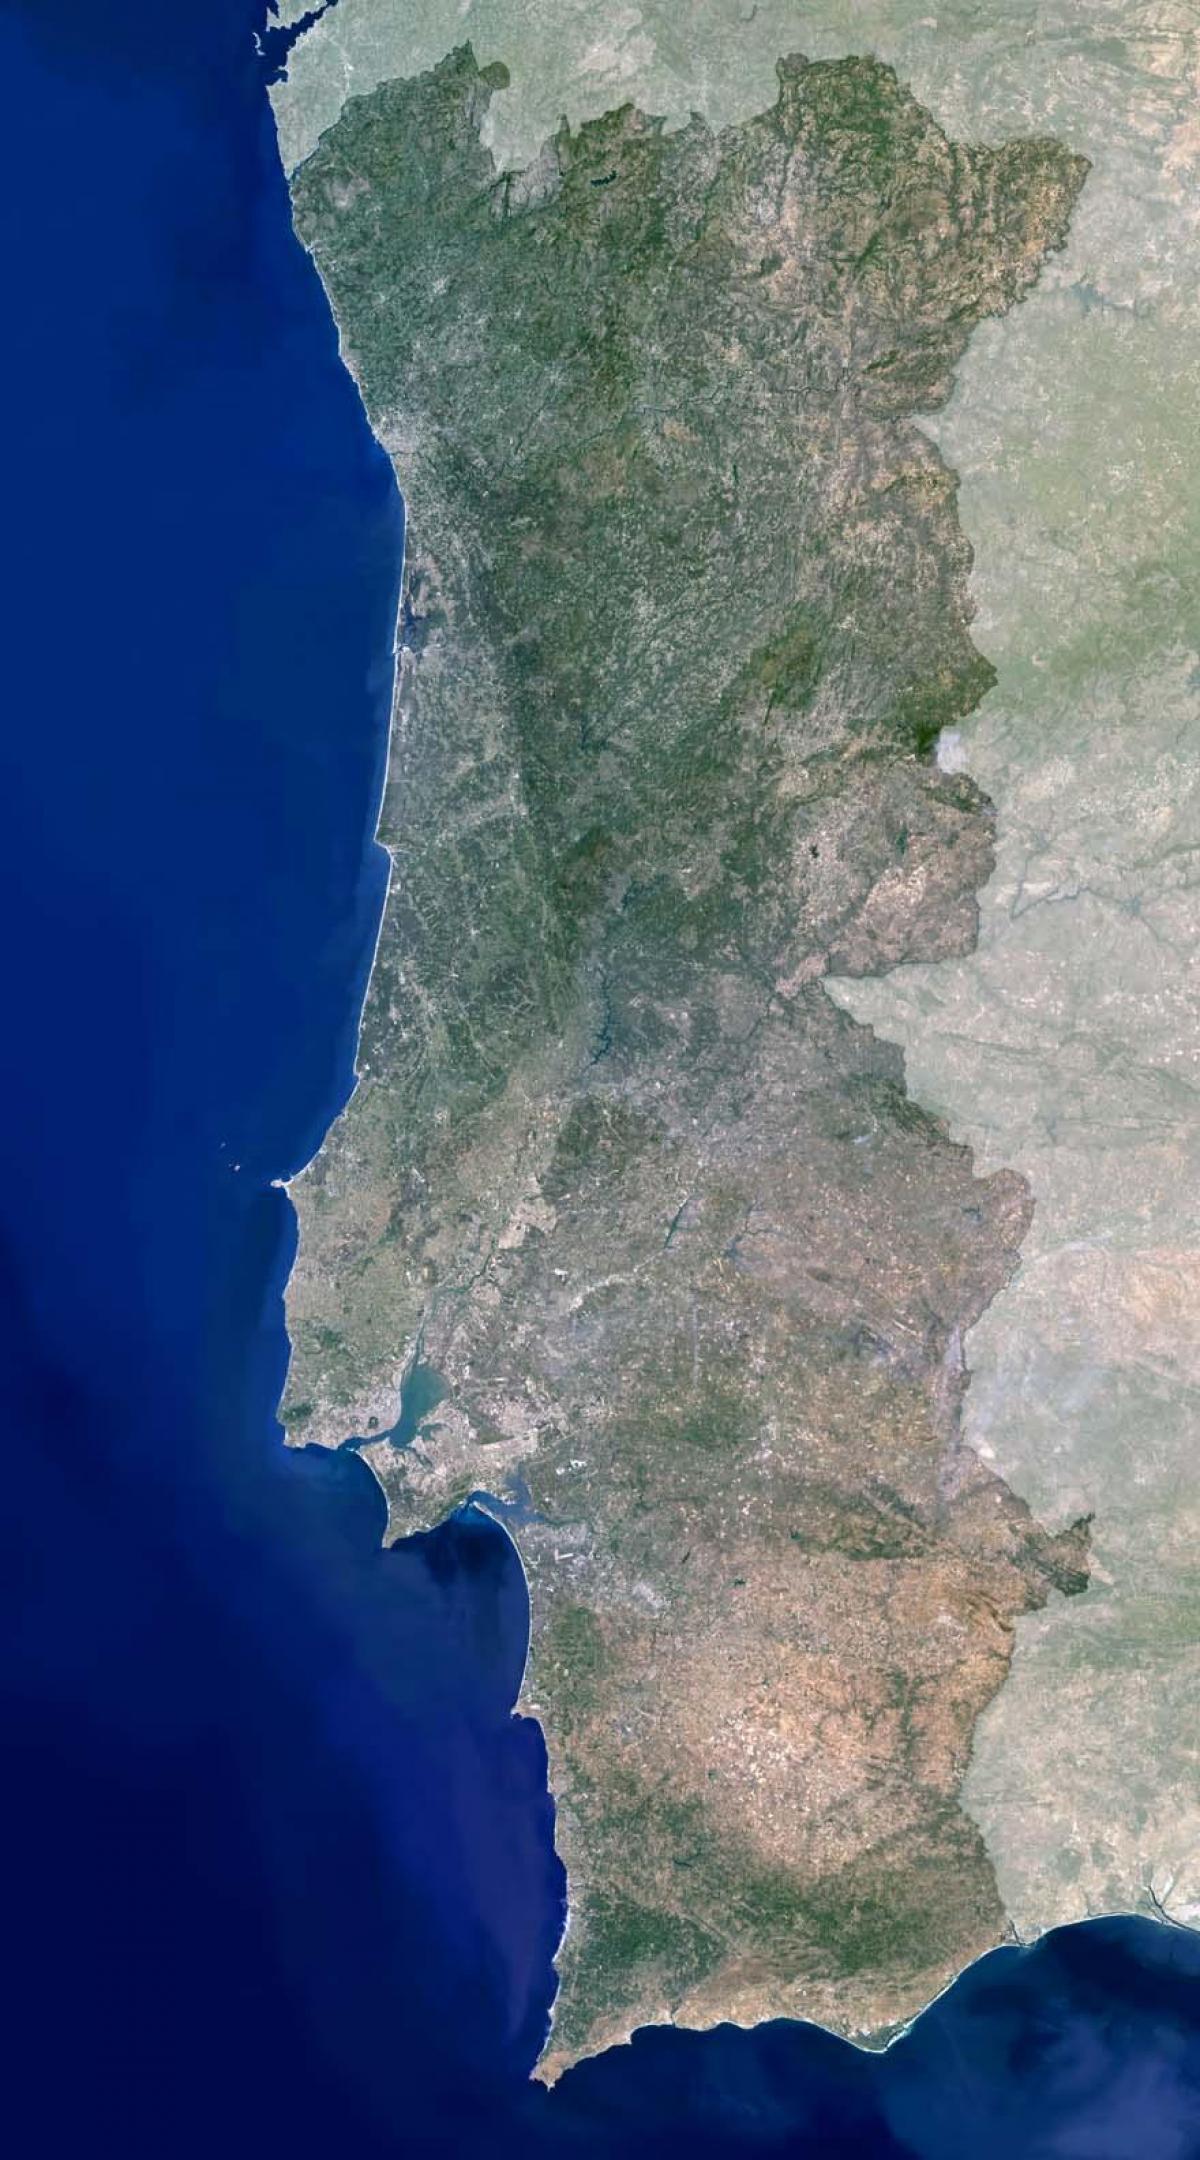 satellit karta europa Portugal satellit karta   Karta över Portugal satellit (Södra  satellit karta europa